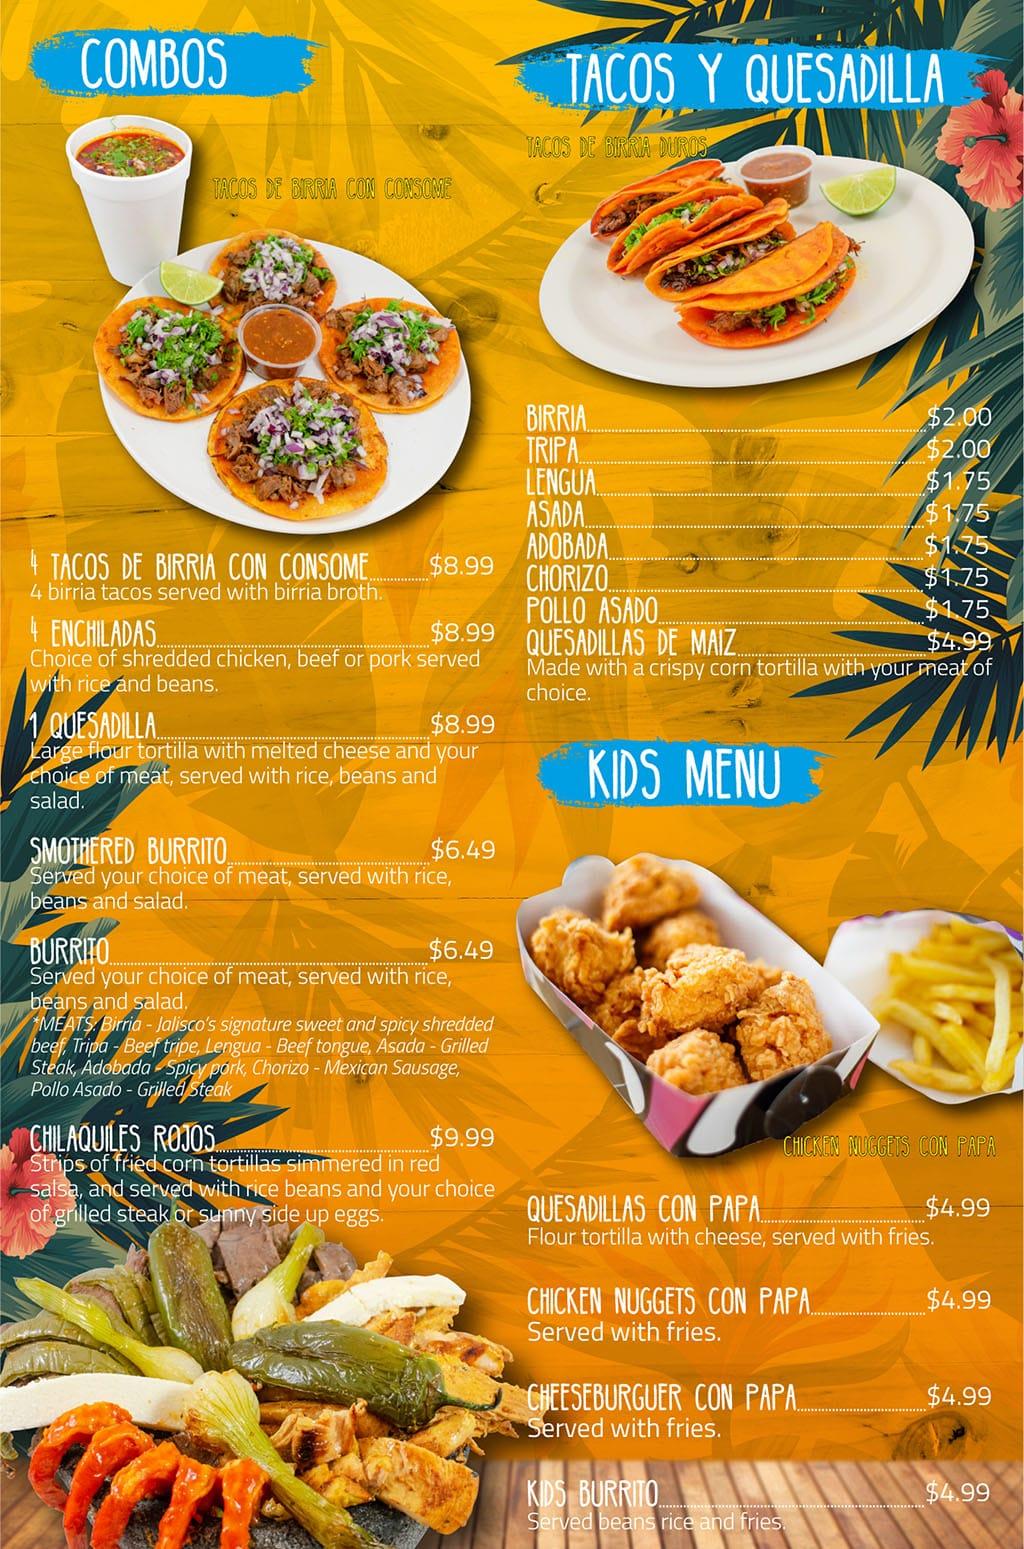 Puerto Vallarta Mexican Grill menu - combos, kids